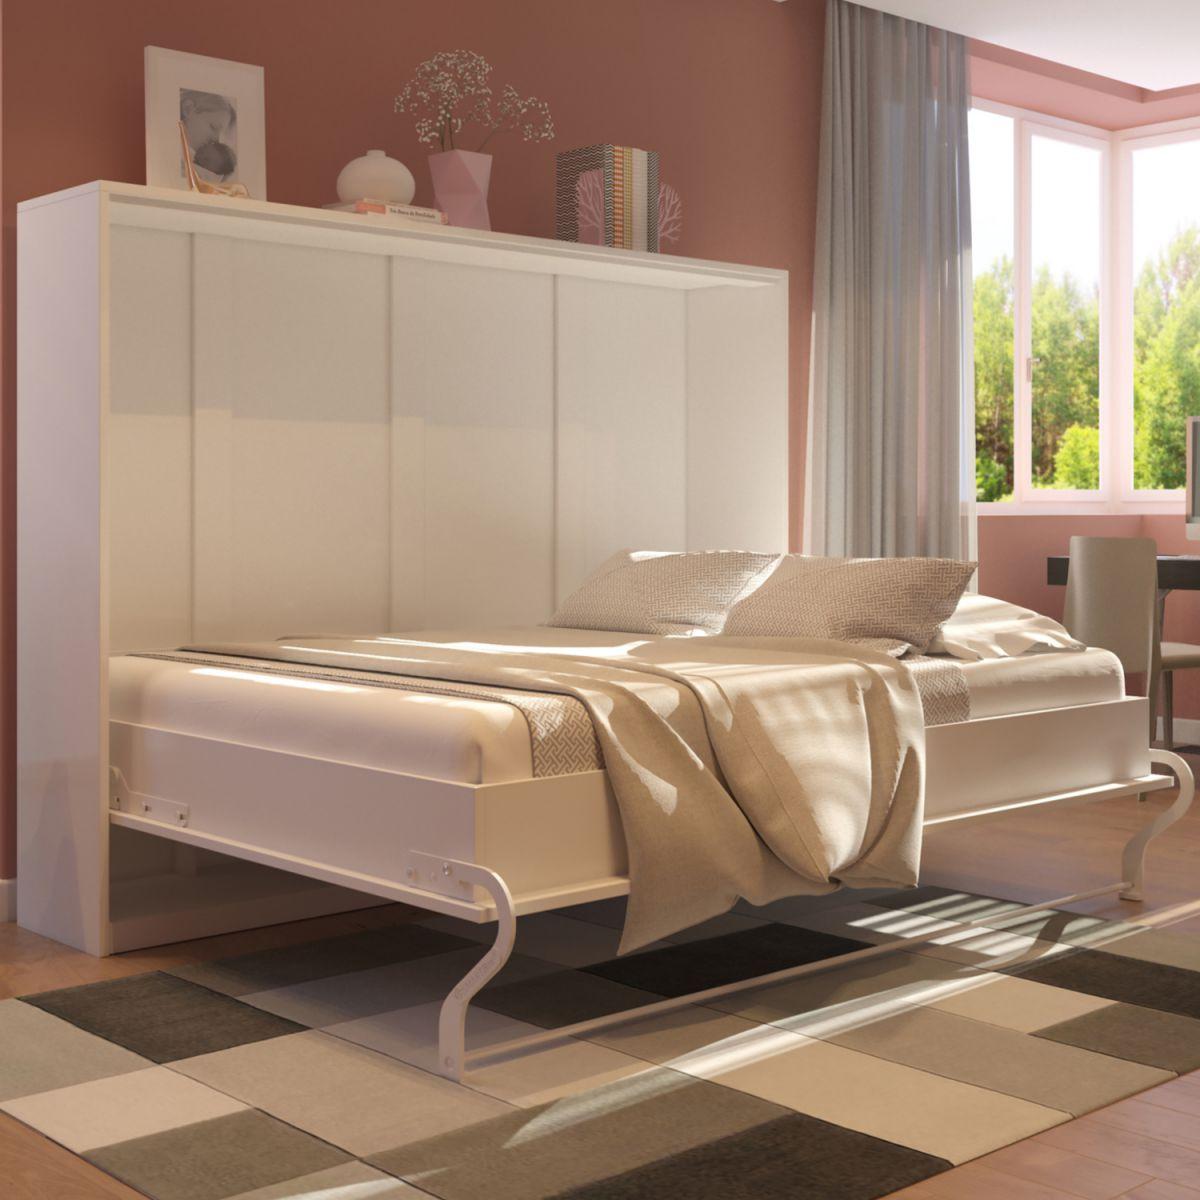 schrankbett 140 horizontal weiss hochglanzfront wandklappbett klappbett ebay. Black Bedroom Furniture Sets. Home Design Ideas